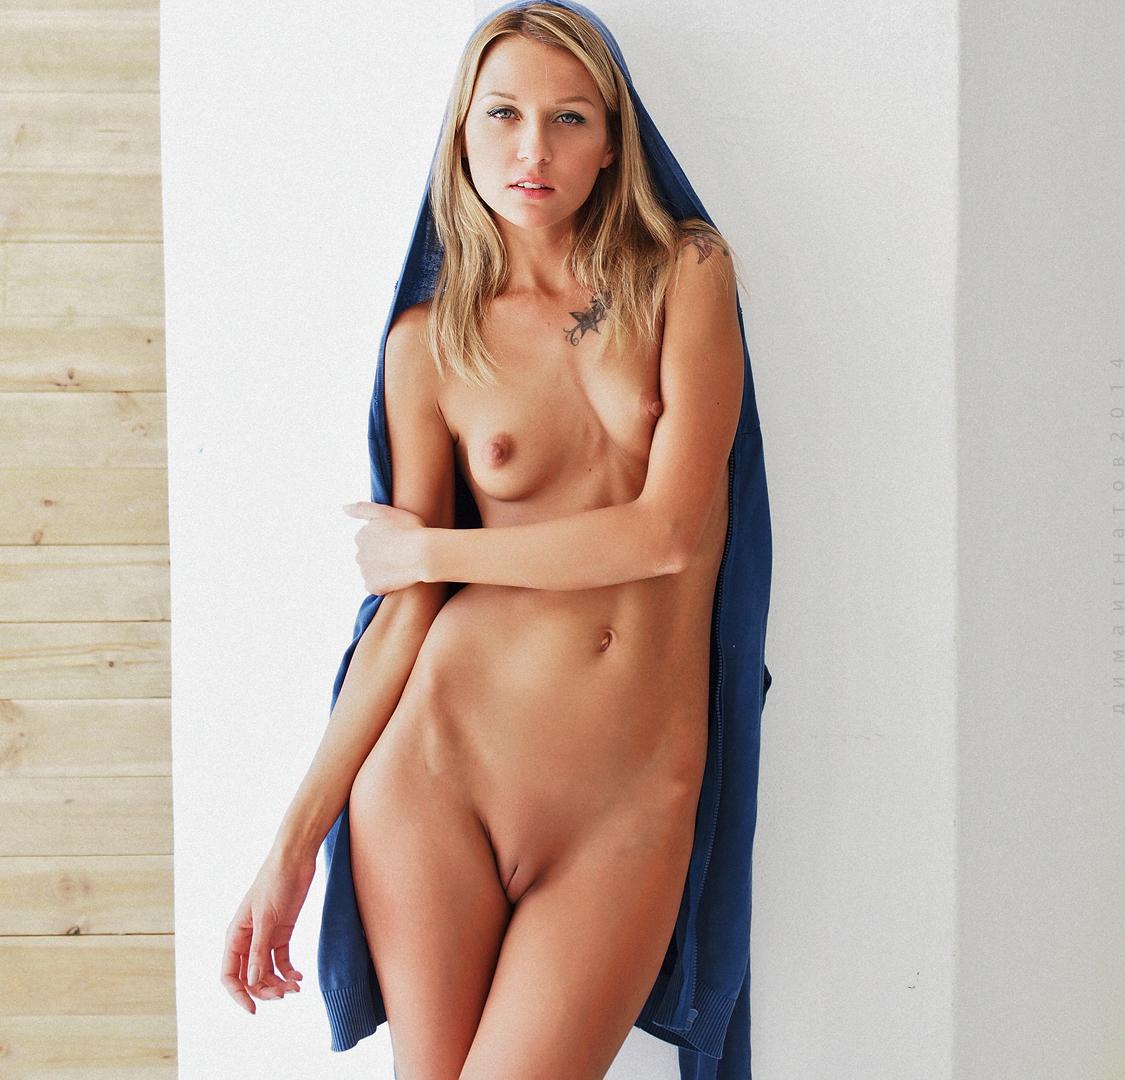 секс знакомства ейск без регистрации